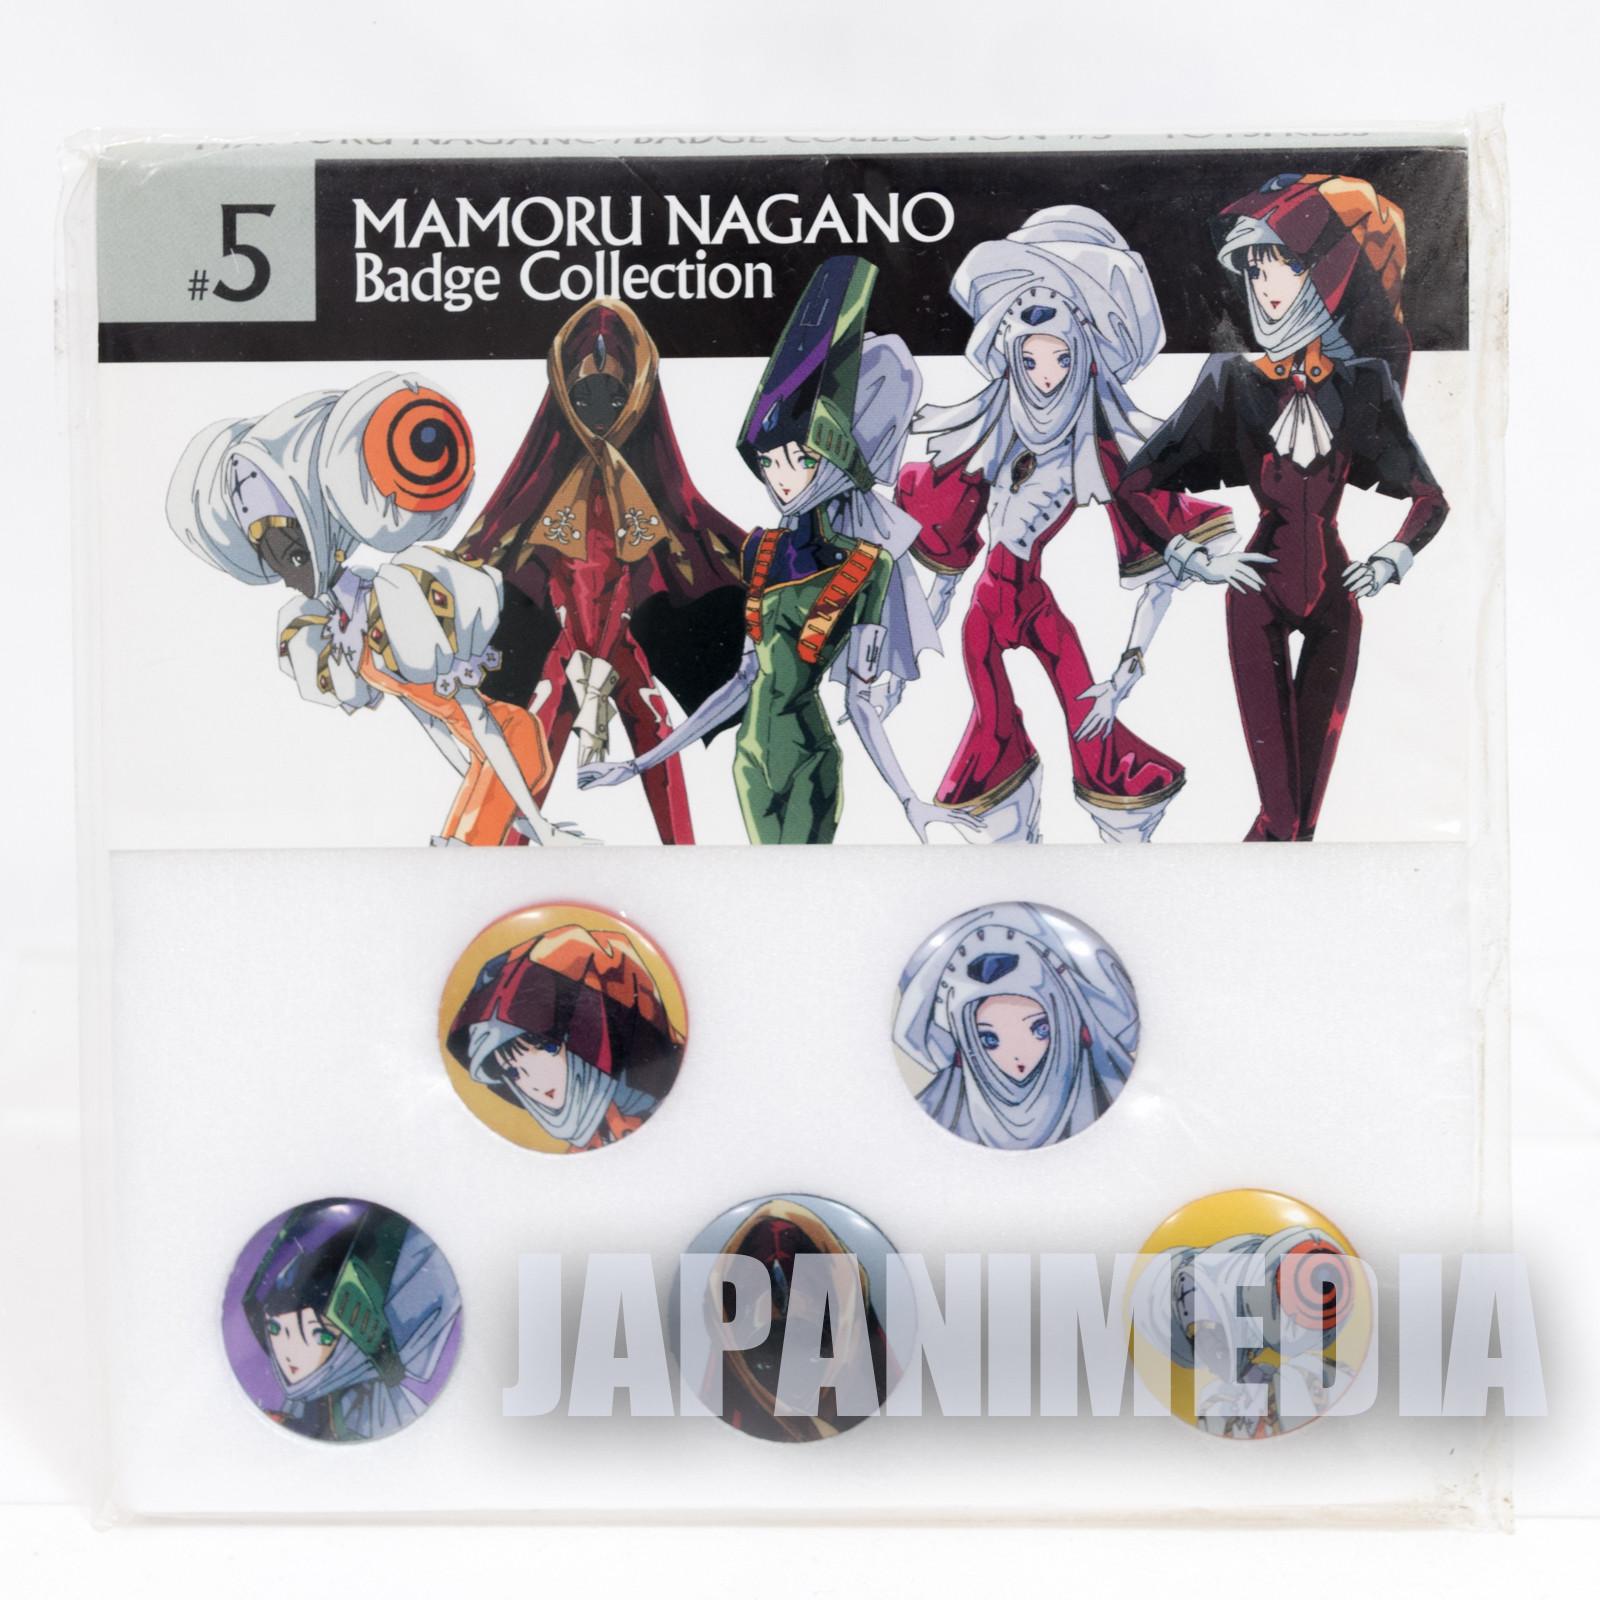 Five Star Stories Mamoru Nagano Button Can badge collection #5 JAPAN ANIME